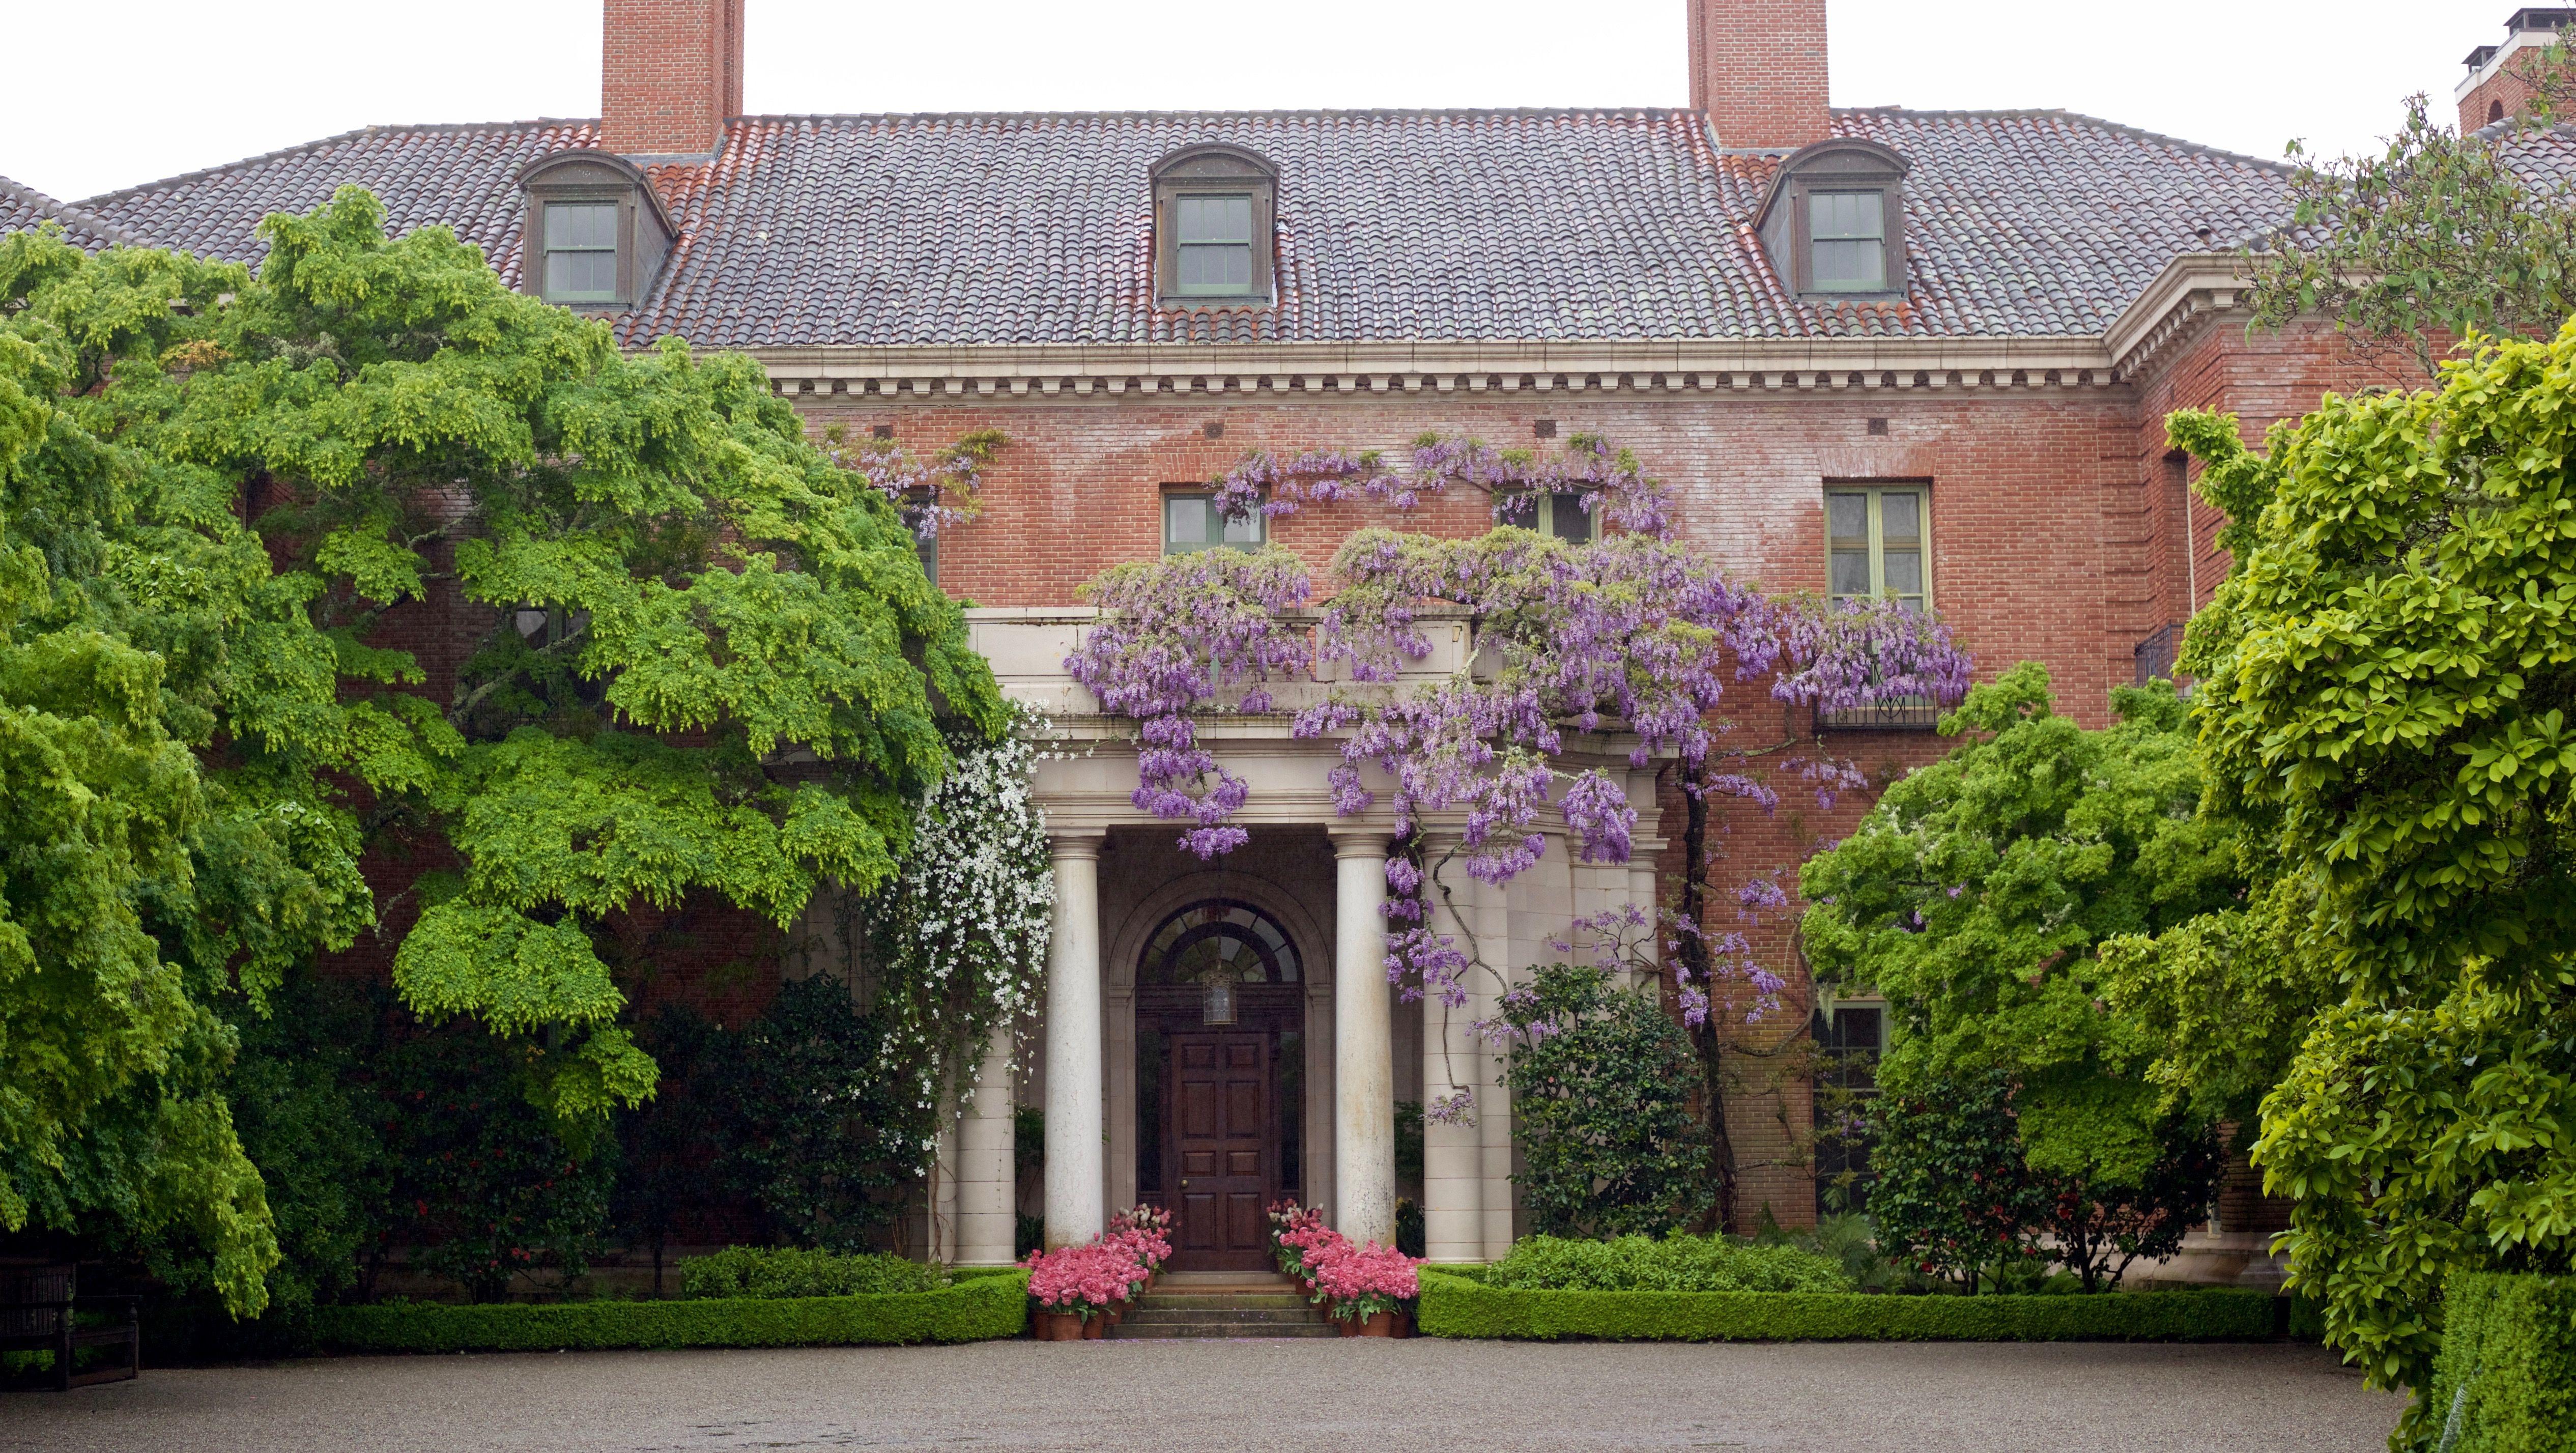 2c5c79a4a435e982d86f925bd9f6a729 - Historic House And Gardens Near Me